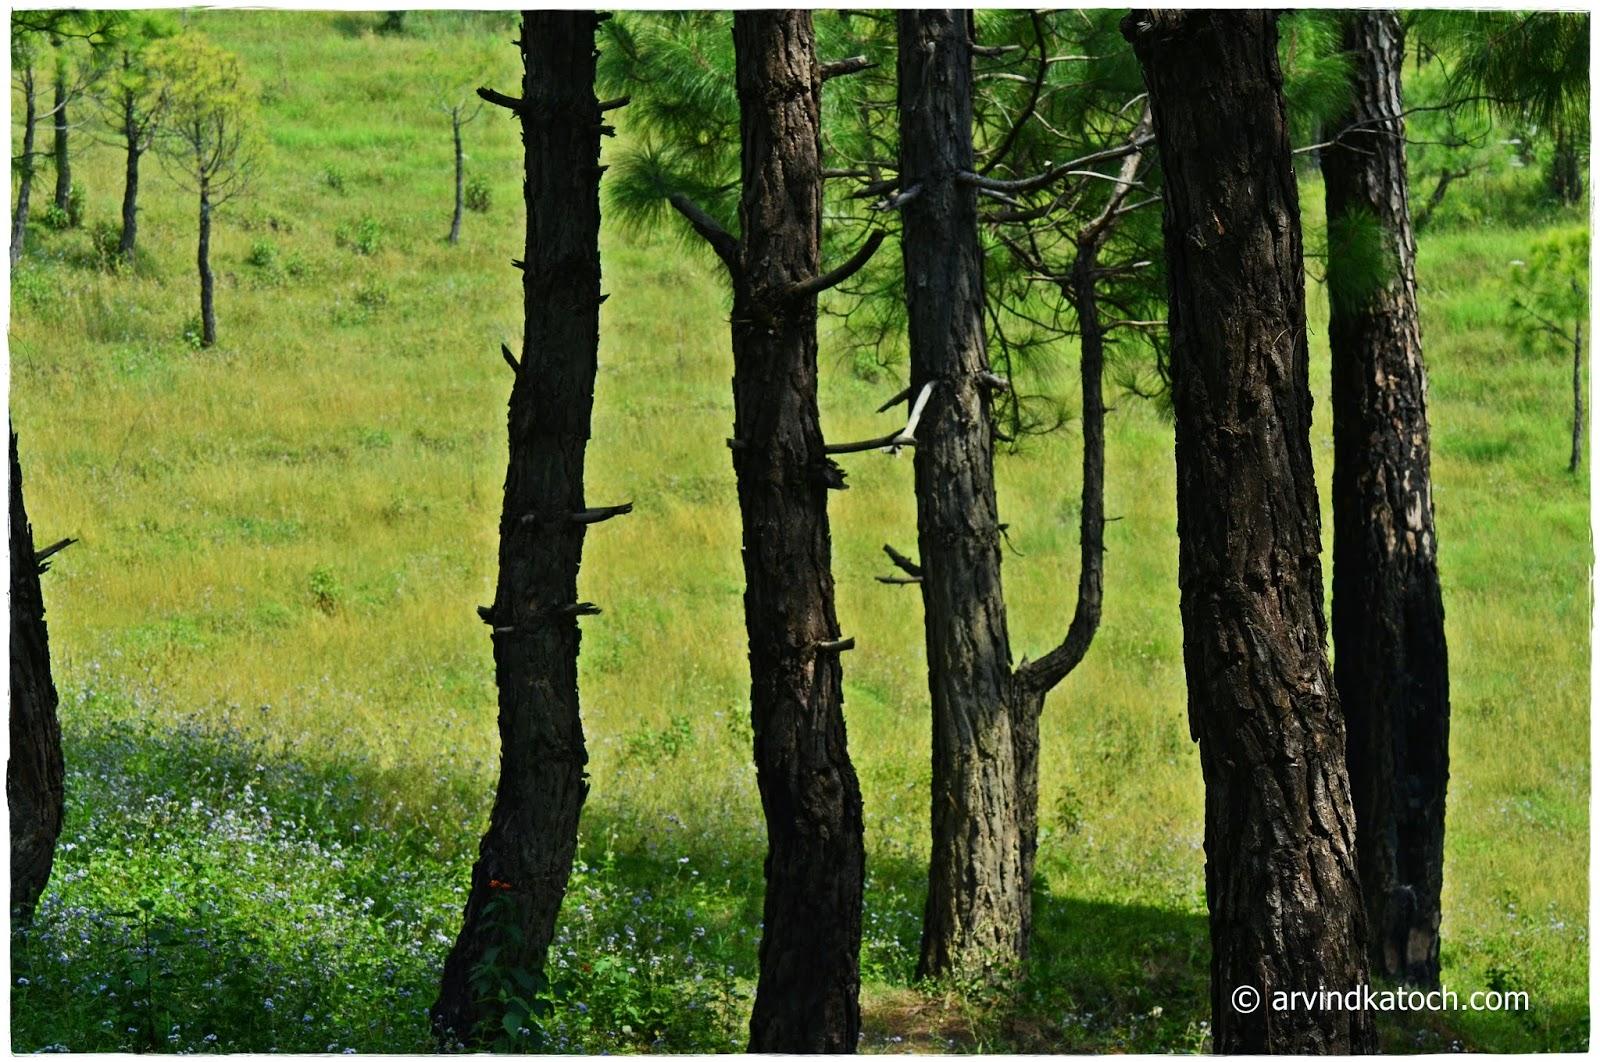 Chir Pine, Pine Tree, Talking Tree, Himachal Pradesh